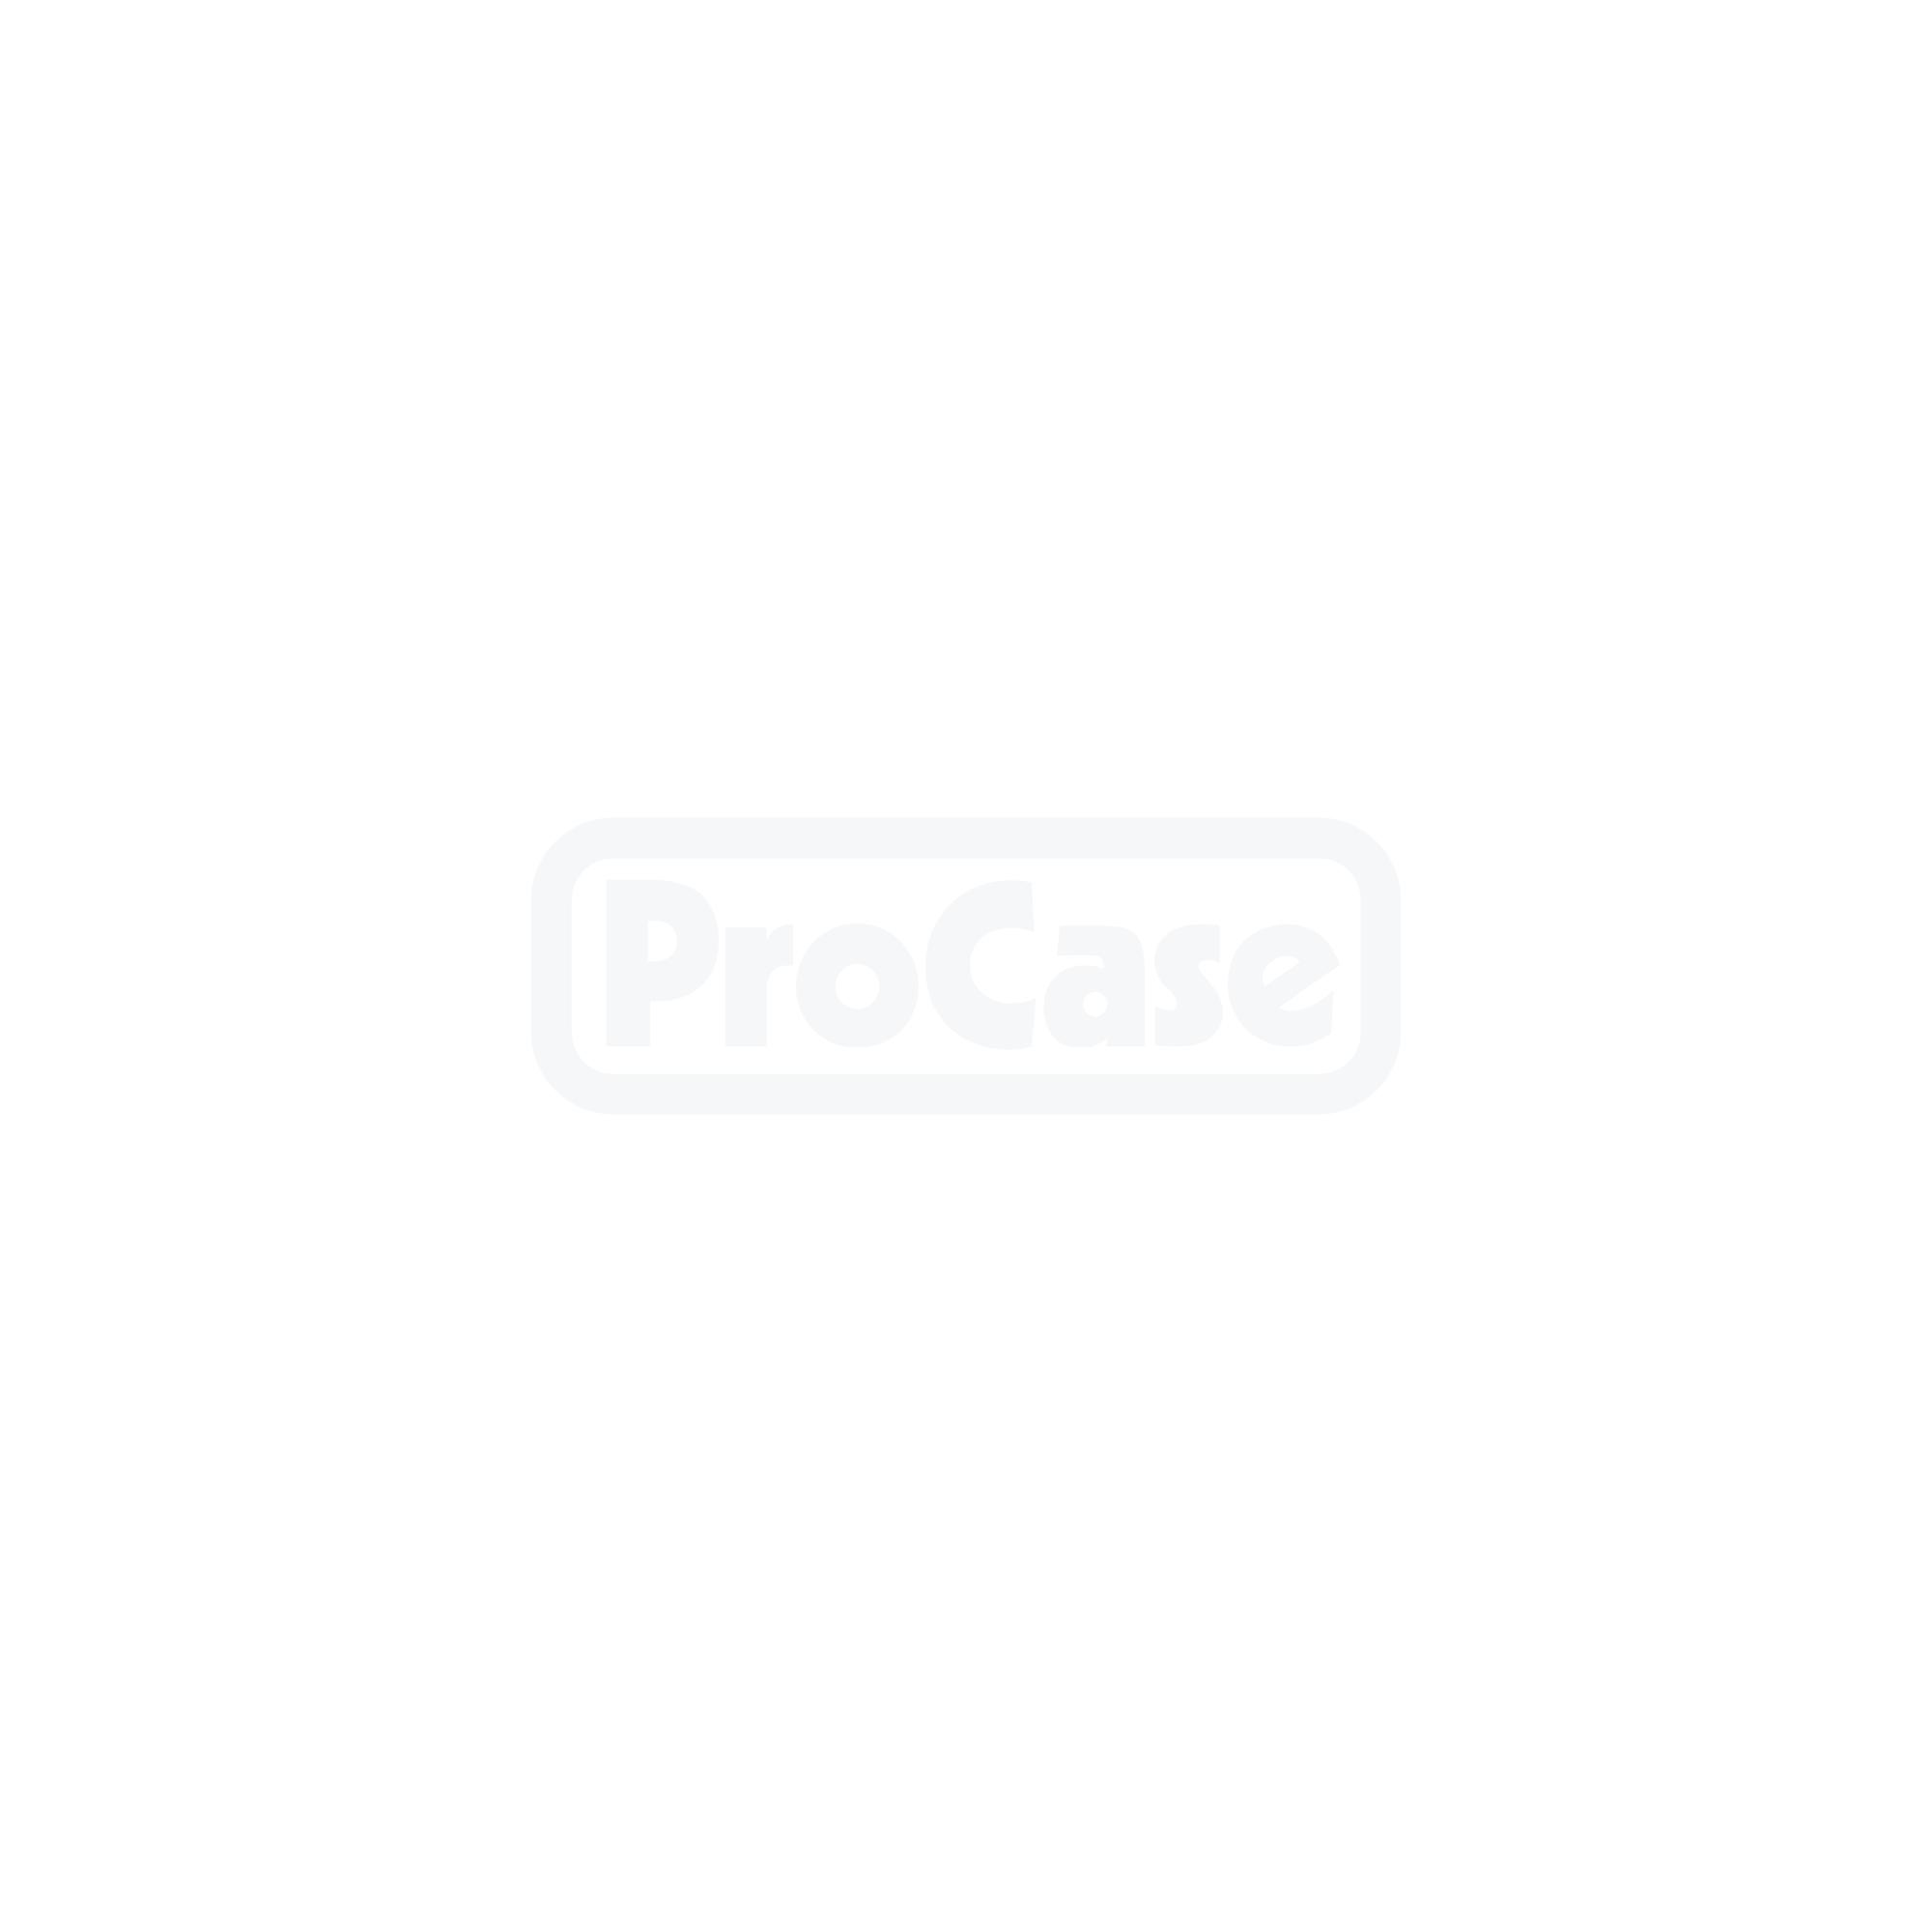 SKB 3i Koffer 0907-6B mit Rasterschaumstoff